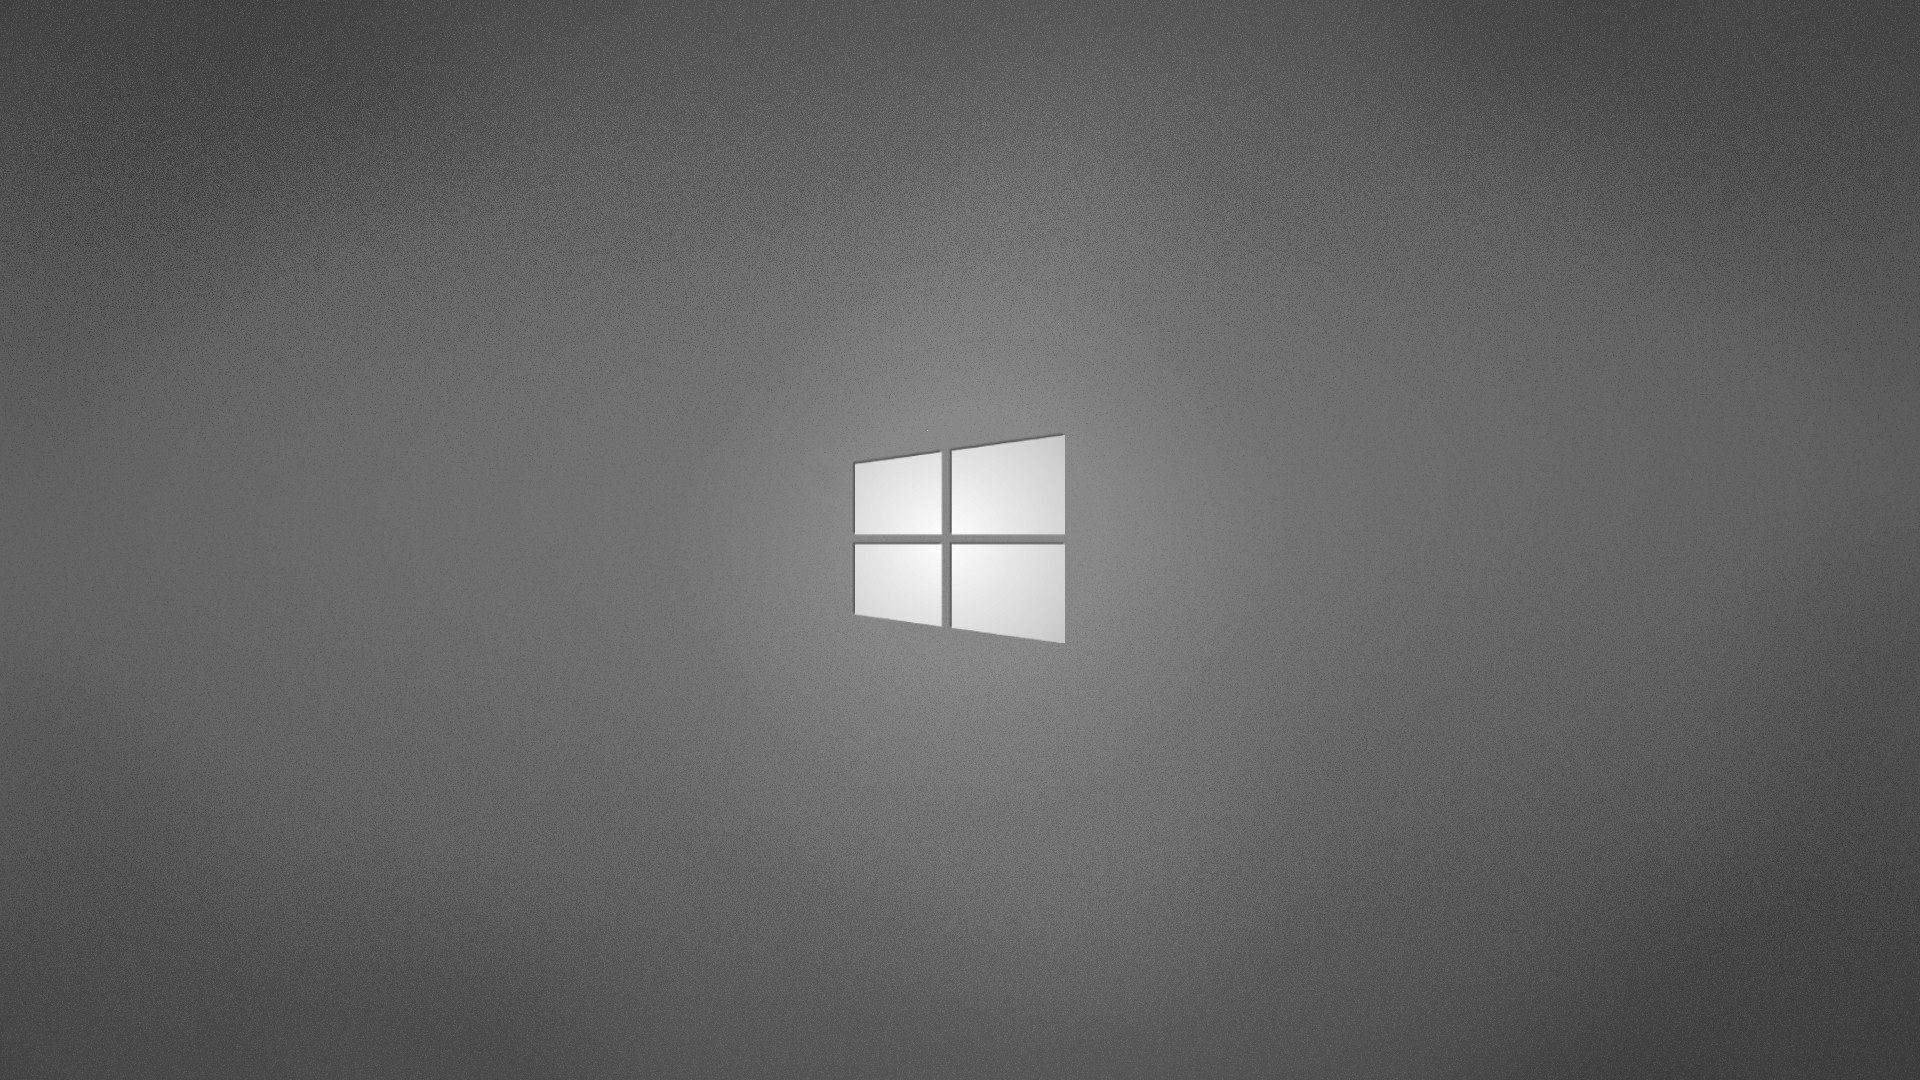 Minimalistic Gray Grey Operating Systems Windows Logo ...